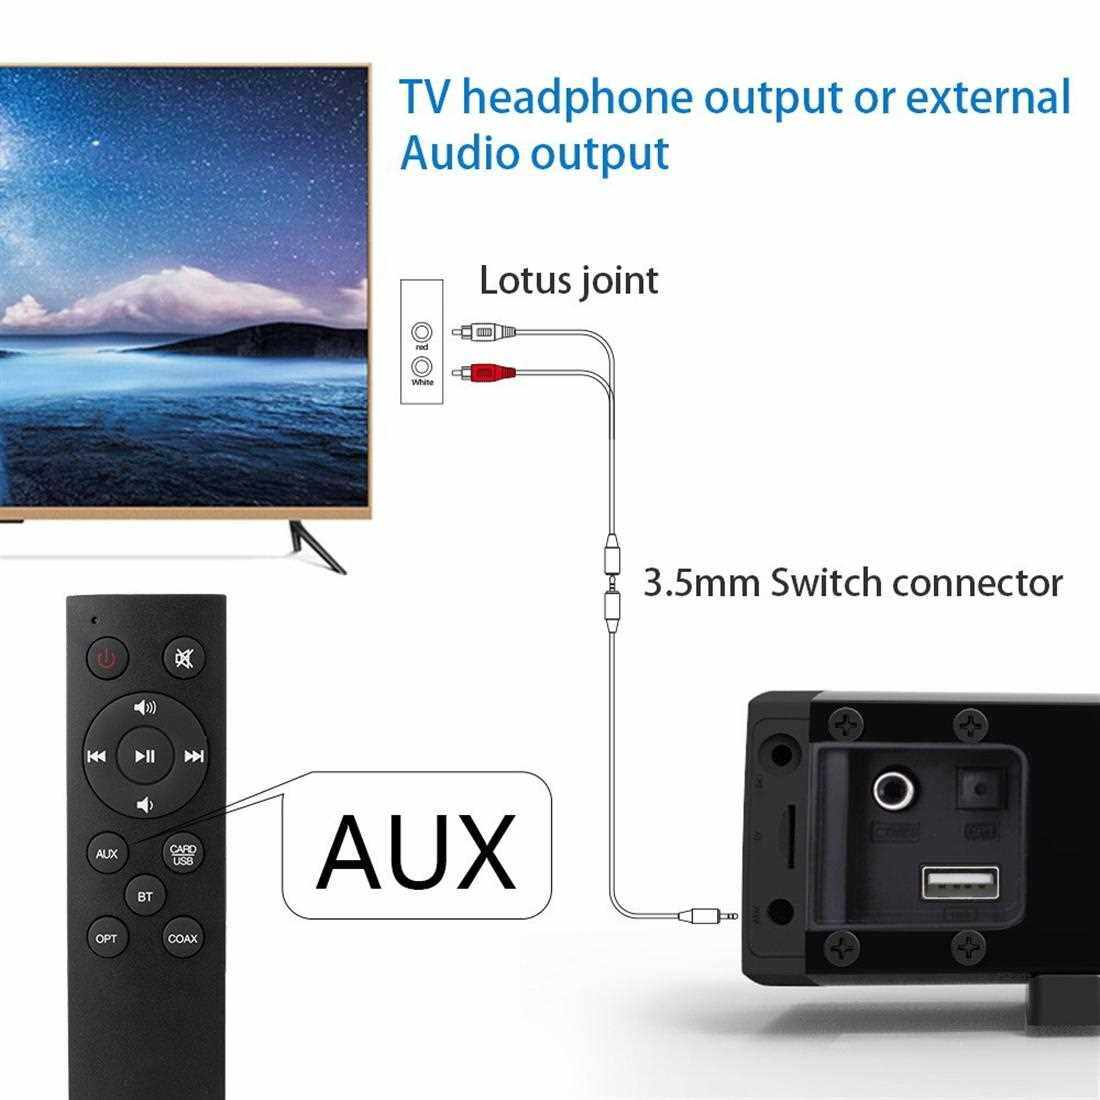 Best Selling LP-09 Sound Bar Subwoof Bluetooth Speaker Home TV Echo Wall Soundbar Wall-mounted Remote Control U-disk Plugging Speaker (Standard)